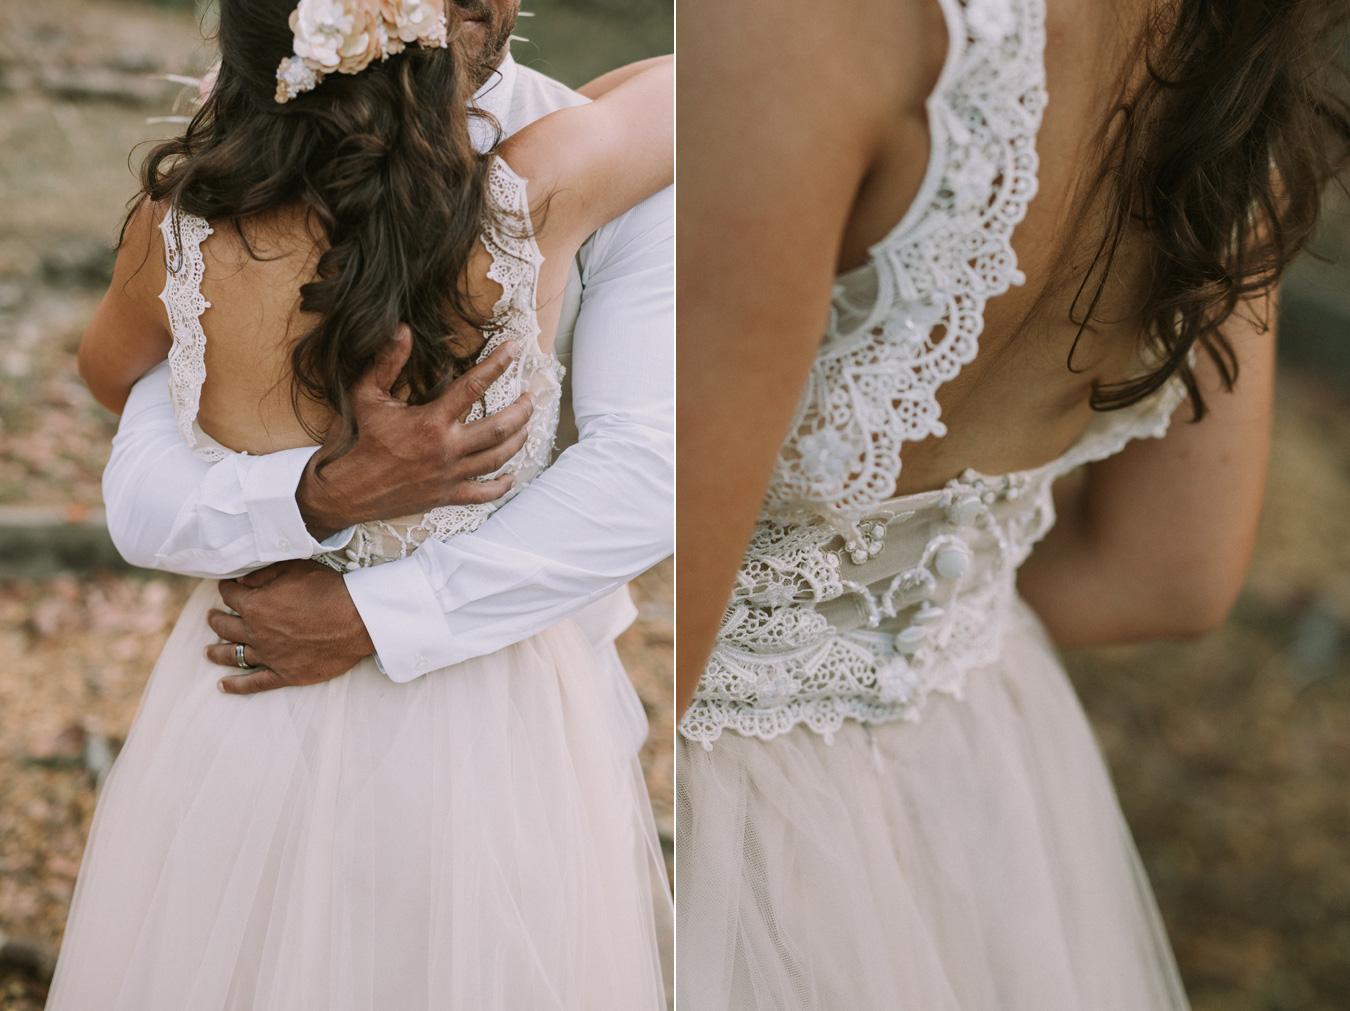 036-destinasjonsbryllup-bryllup-i-utlandet-tone-tvedt.jpg